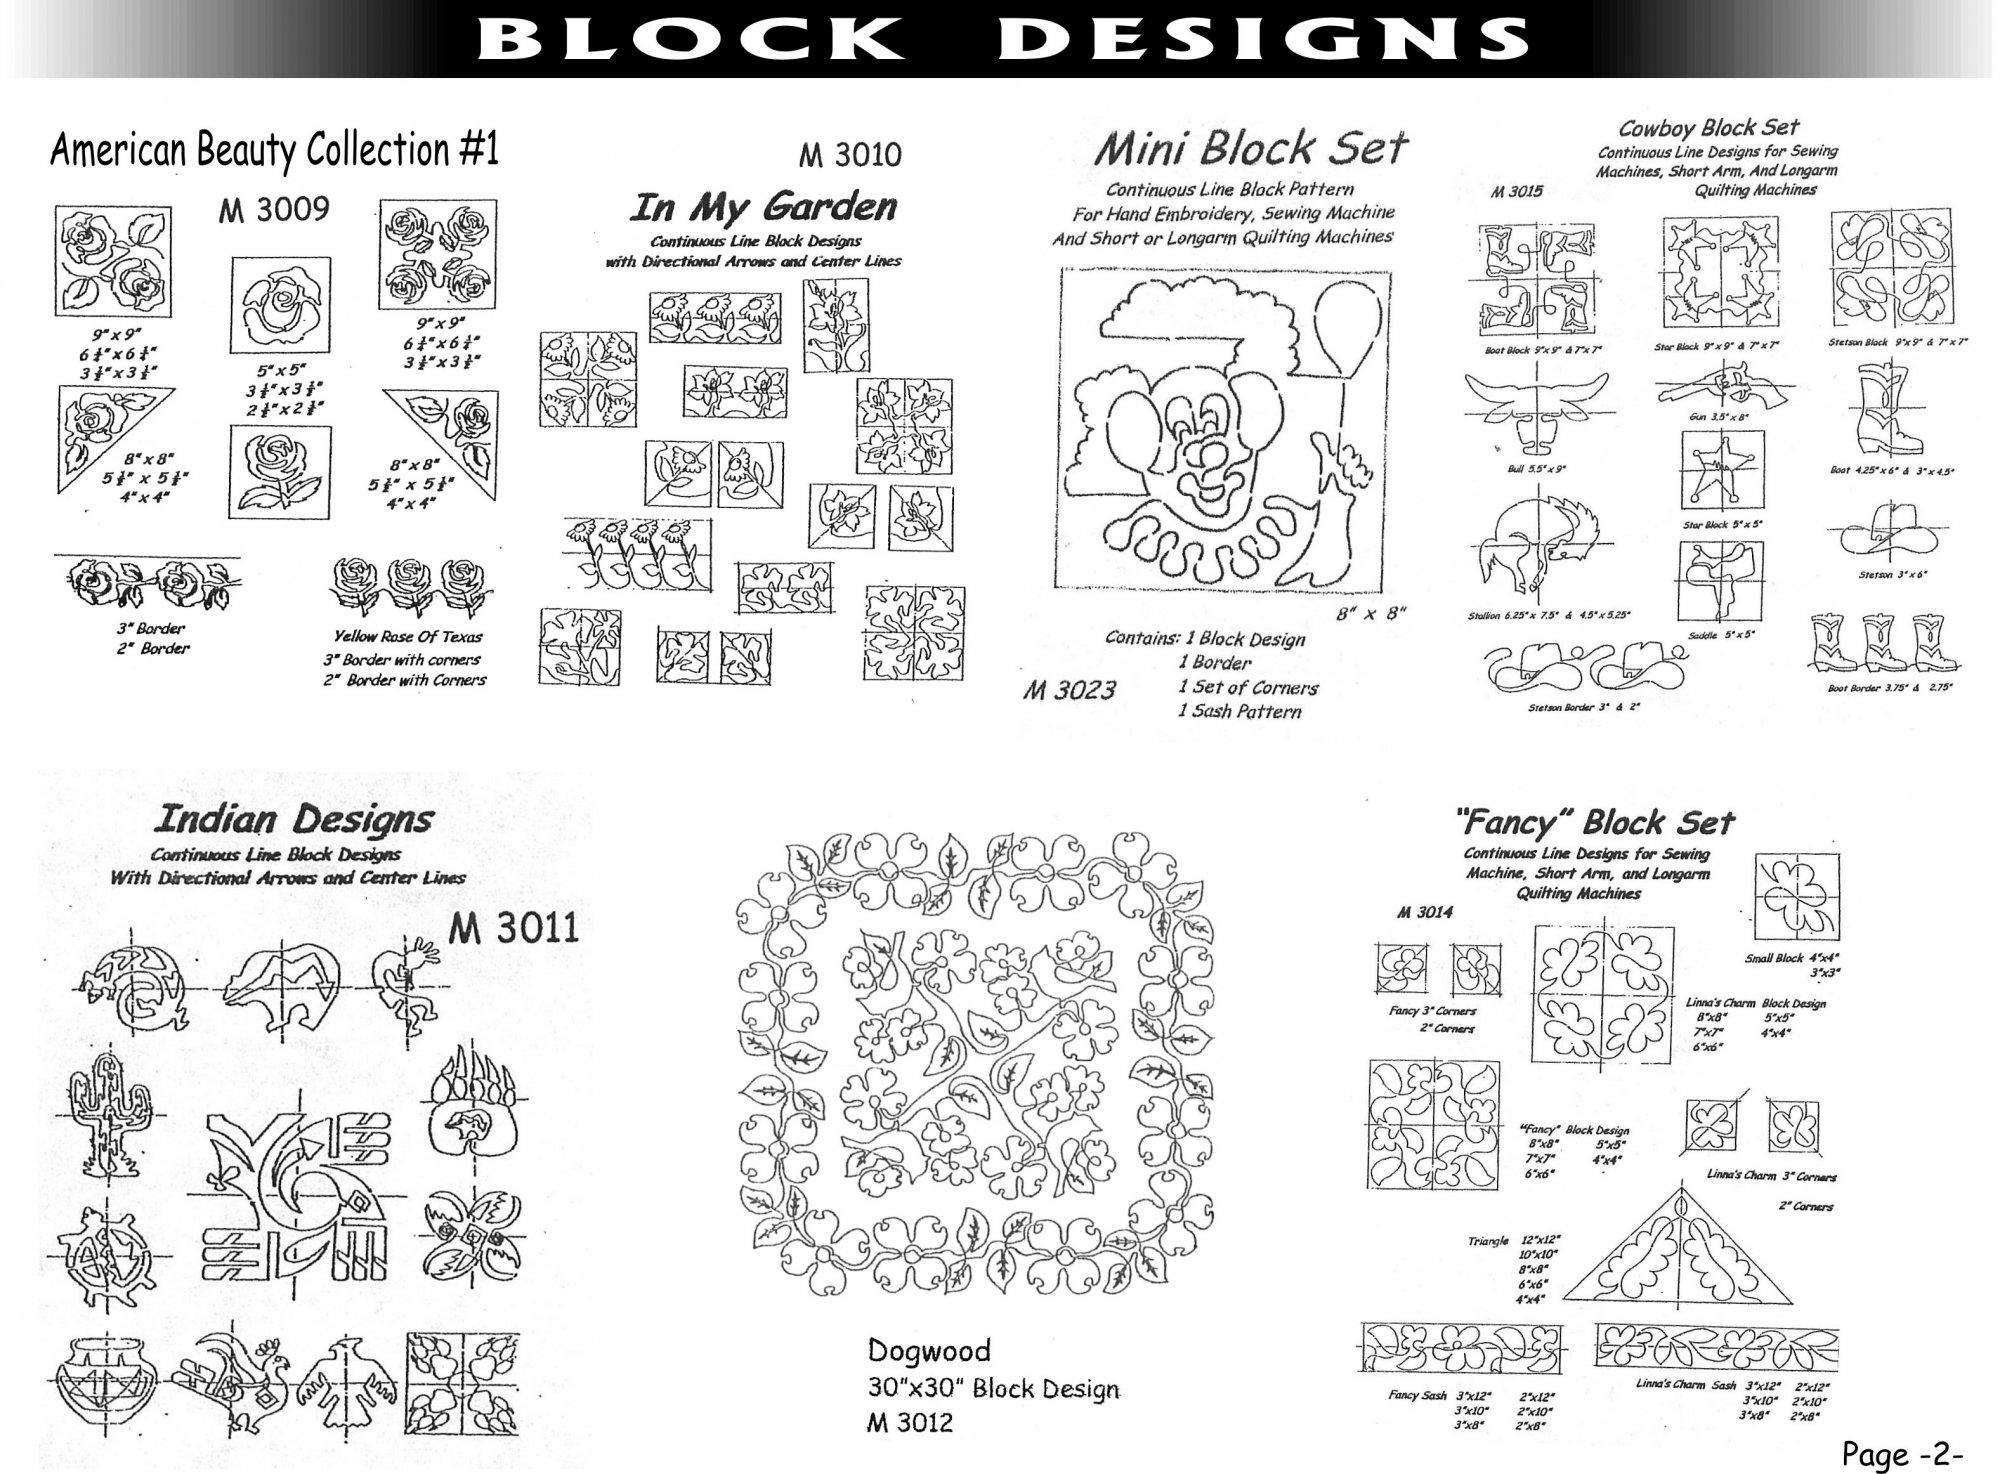 Pantographs-Block Designs-B-13 - 18